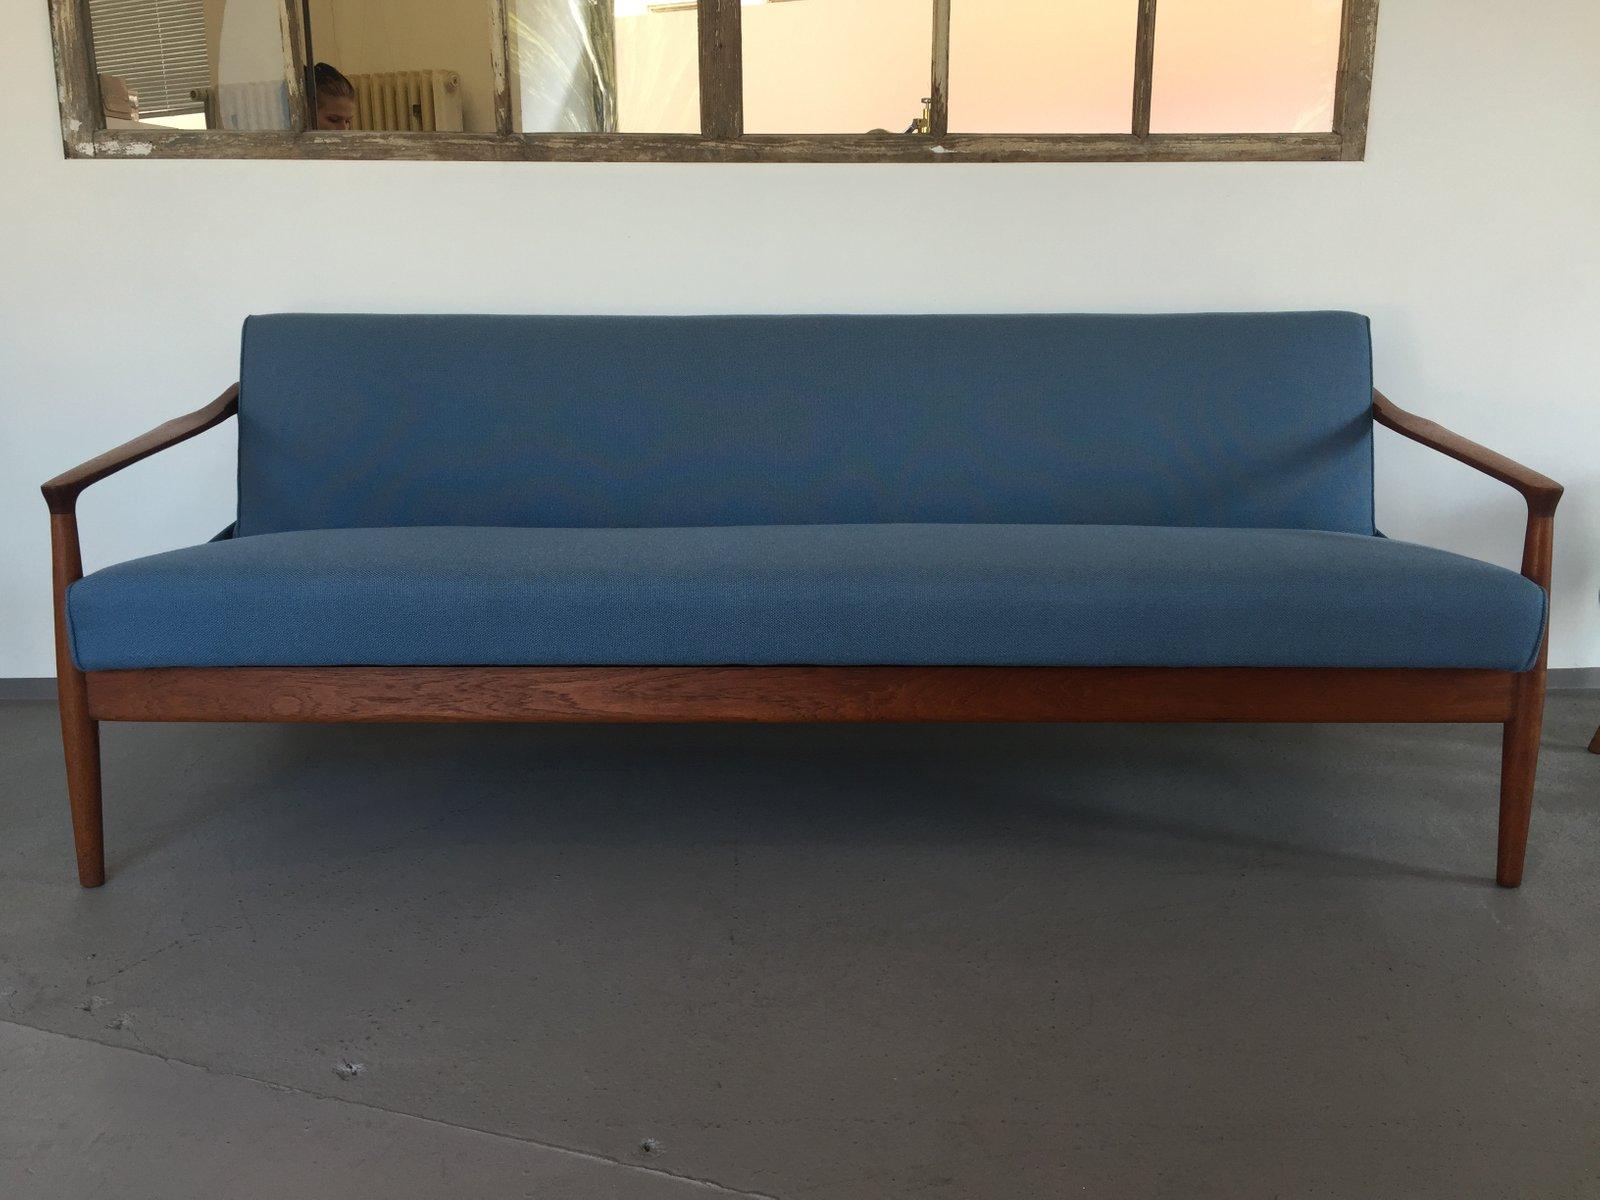 d nisches 3 sitzer sofa aus teakholz bei pamono kaufen. Black Bedroom Furniture Sets. Home Design Ideas